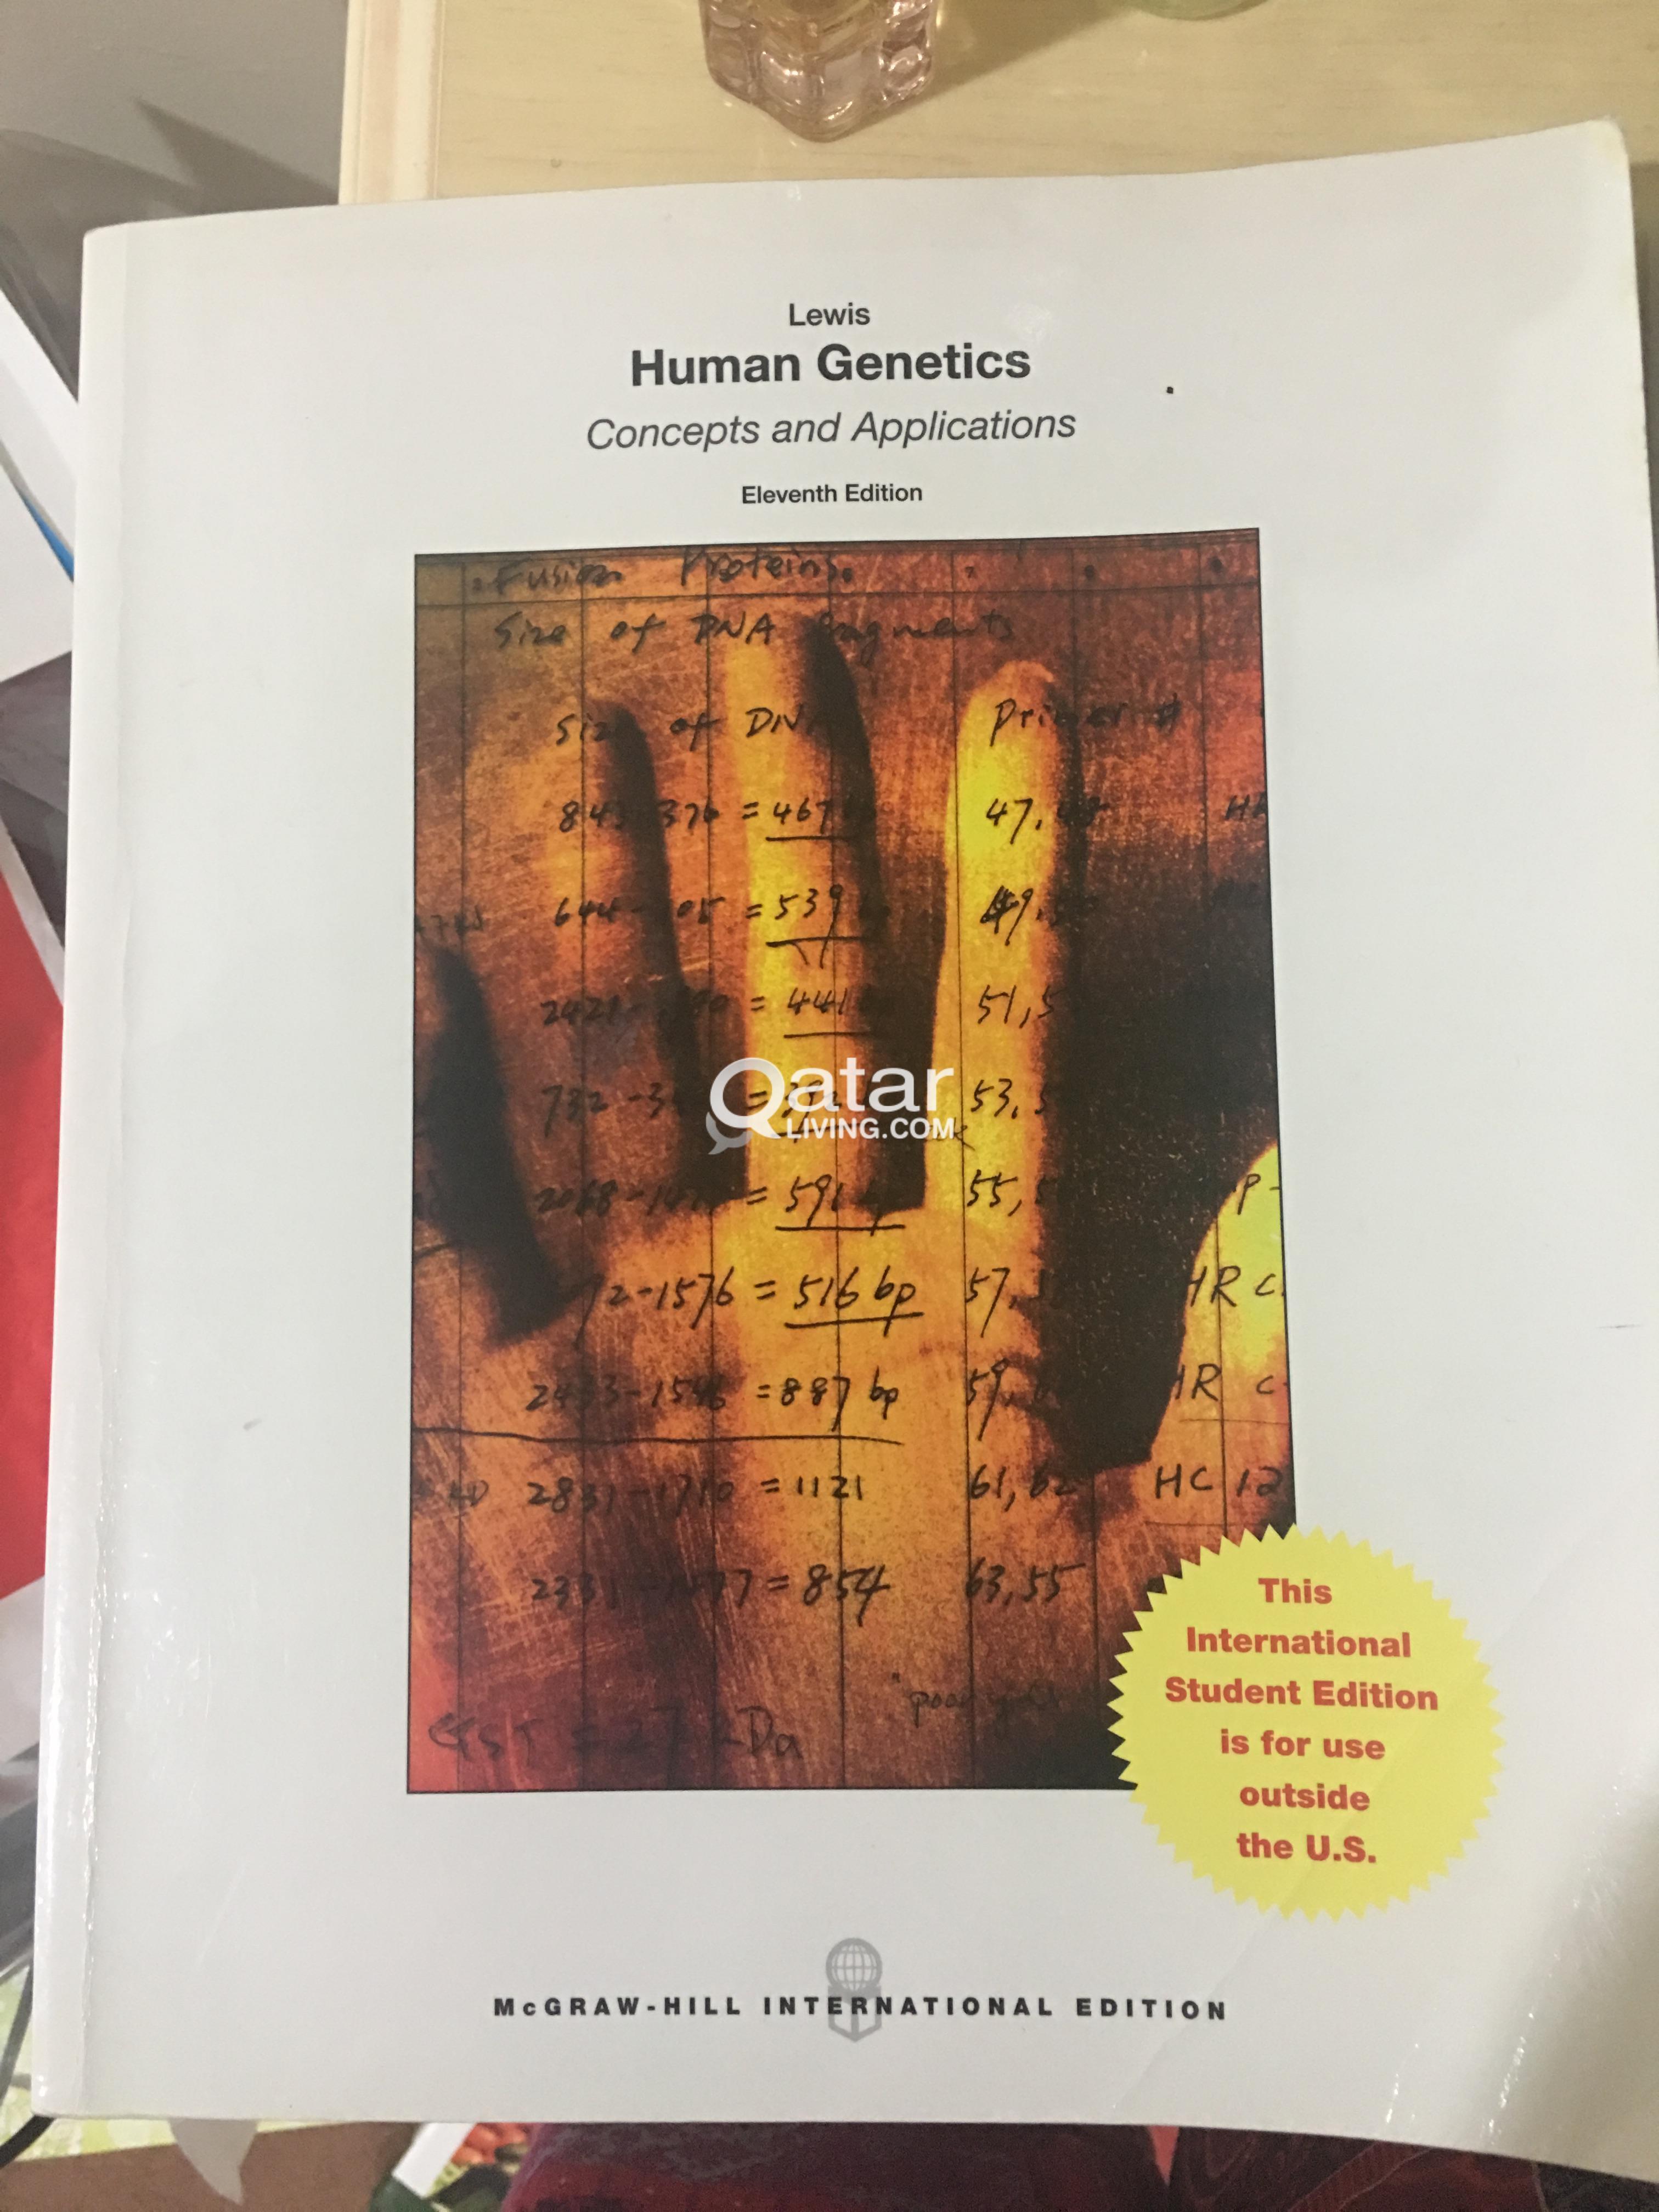 Topmoderne organic chemistry, biochemistry ,biology , genetics Books for CS-74